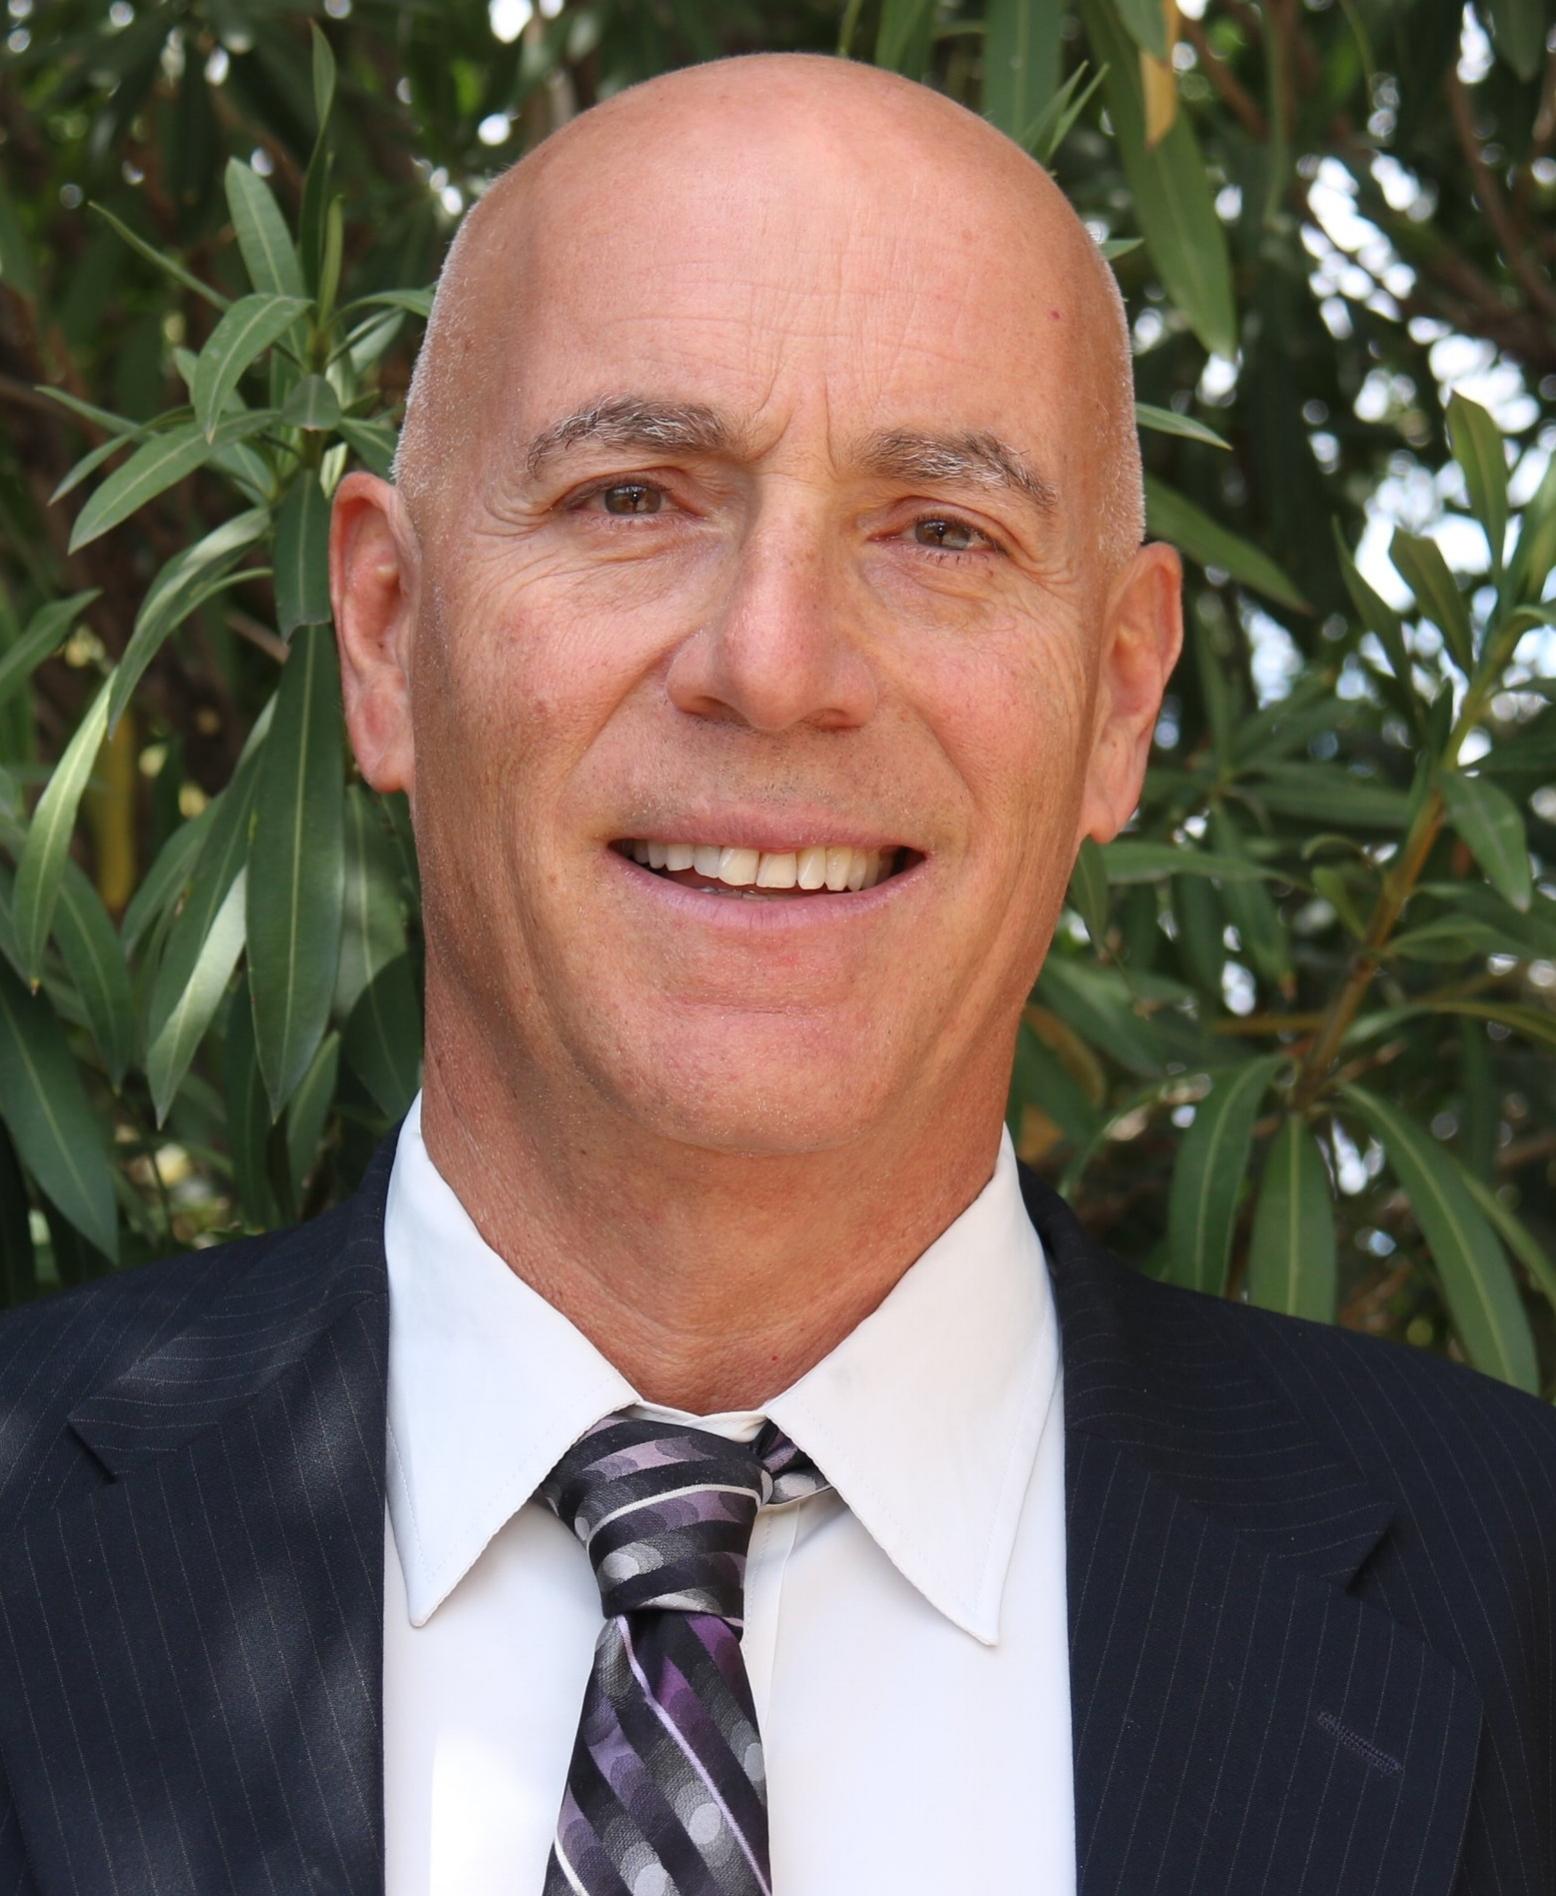 Eric Schindler